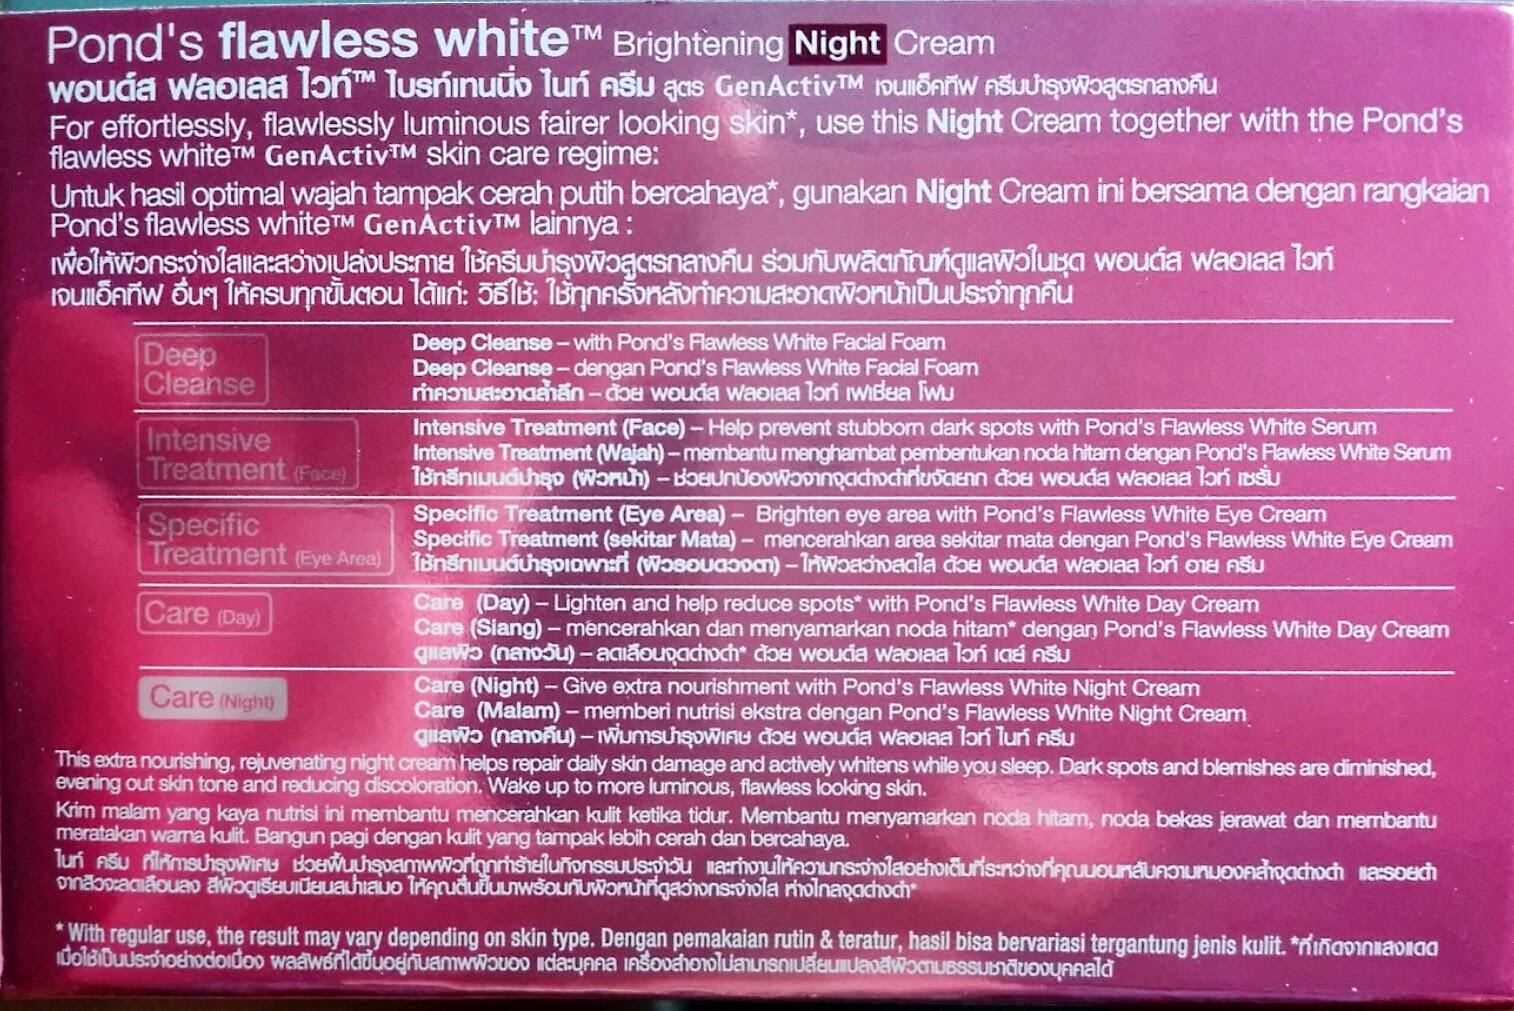 Lakwatserang Bulakenya Bdj Box Unboxing March Ponds Exclusive Flawless White Ultra Luminous Serum 30ml Re Brightening Night Cream 50g Php340